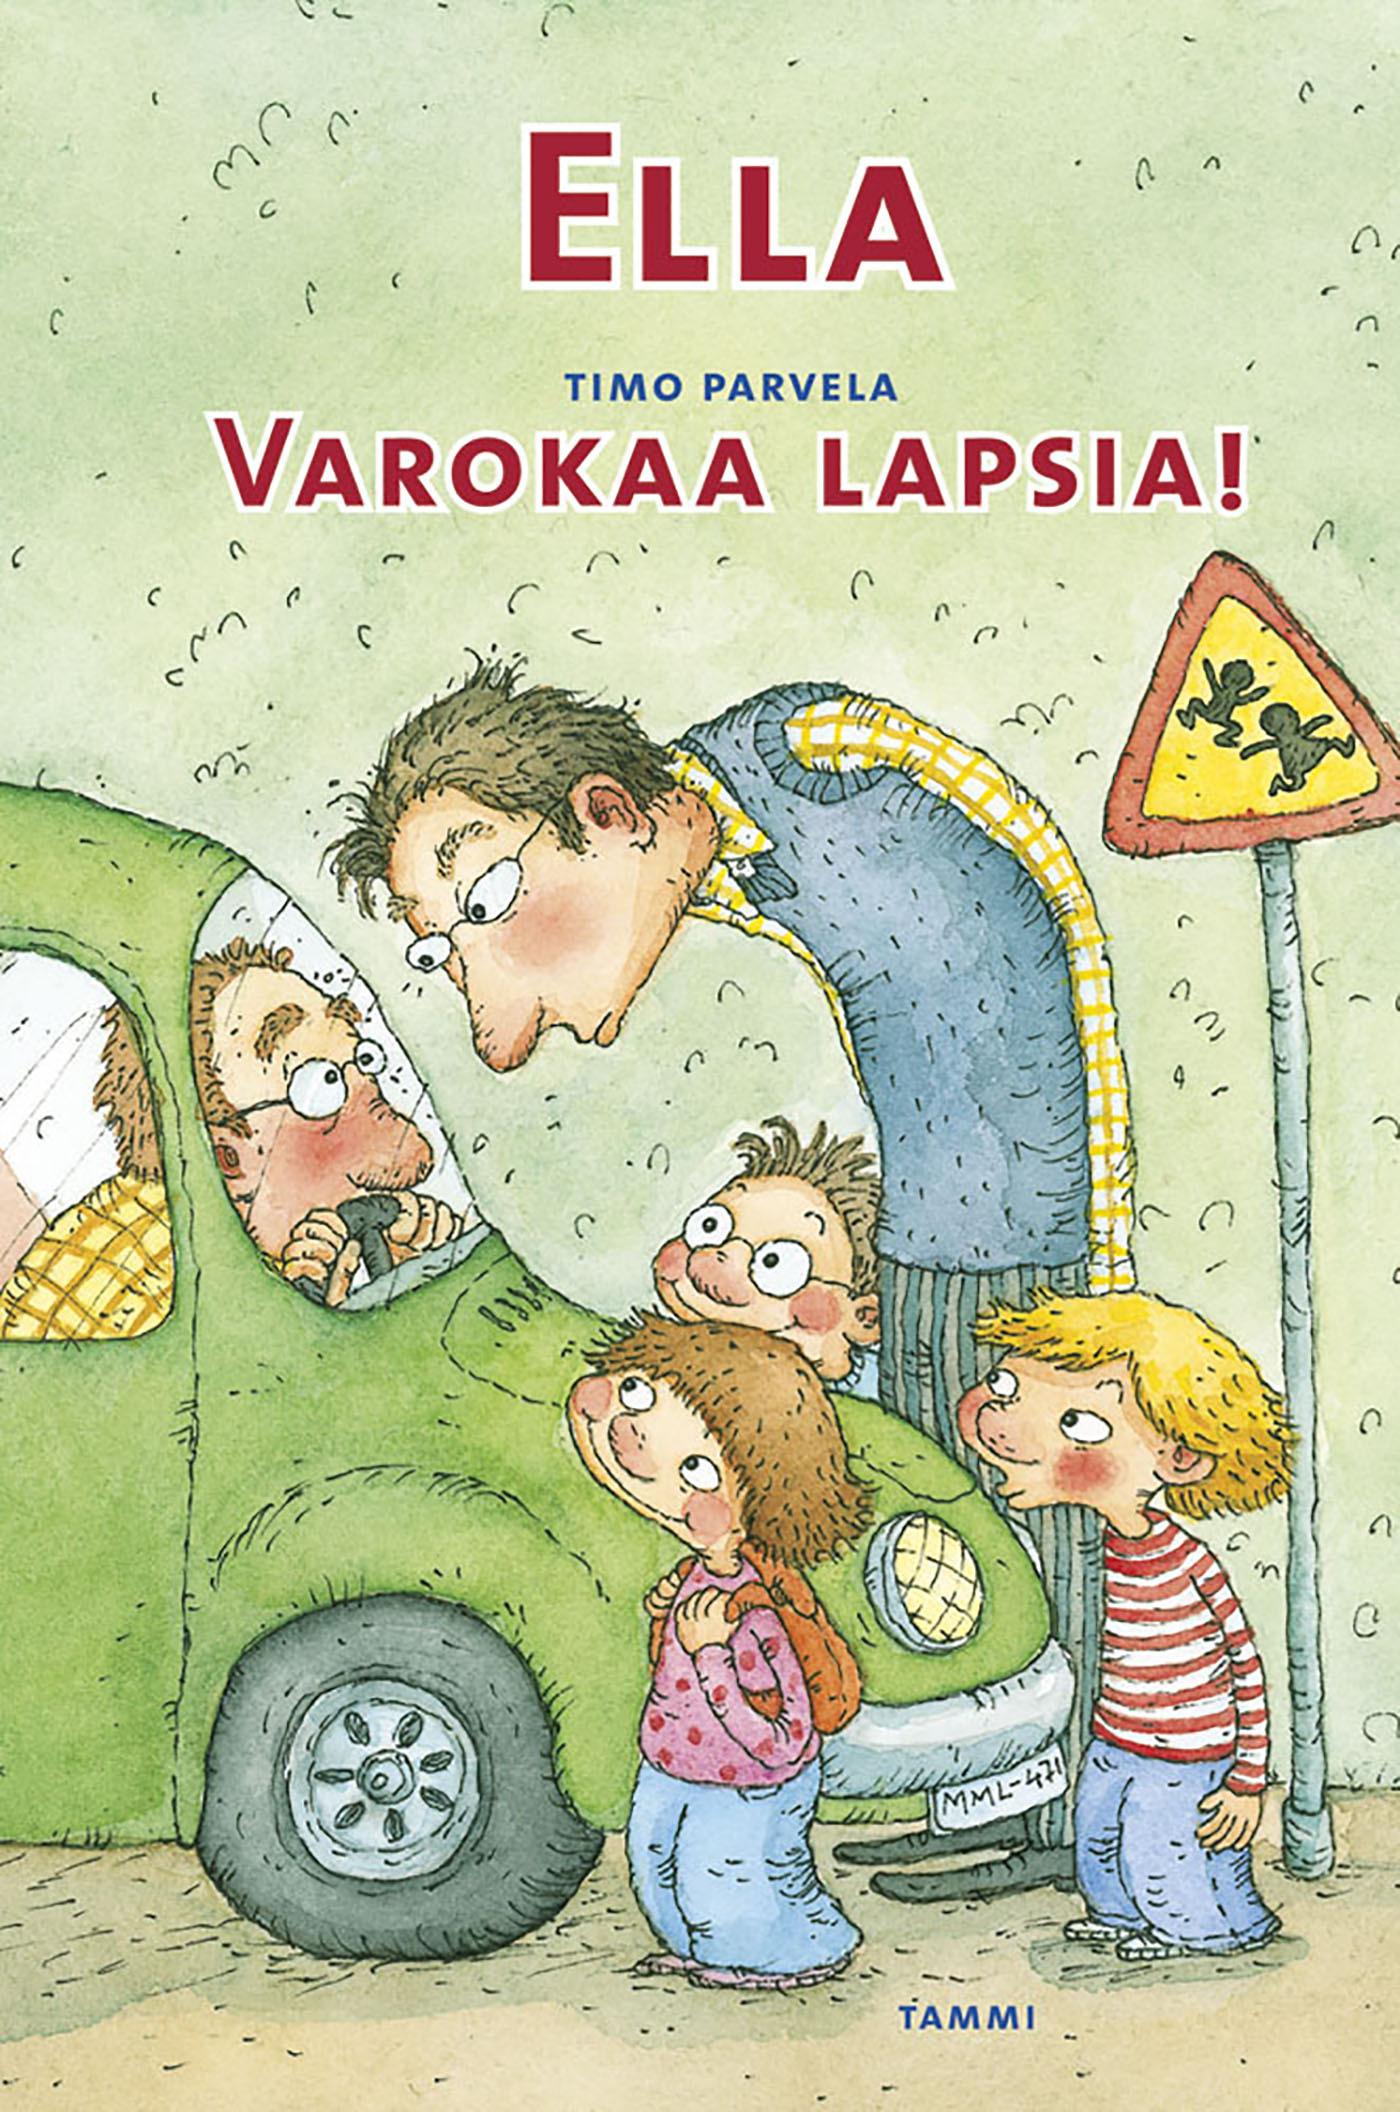 Parvela, Timo - Ella. Varokaa lapsia!, ebook